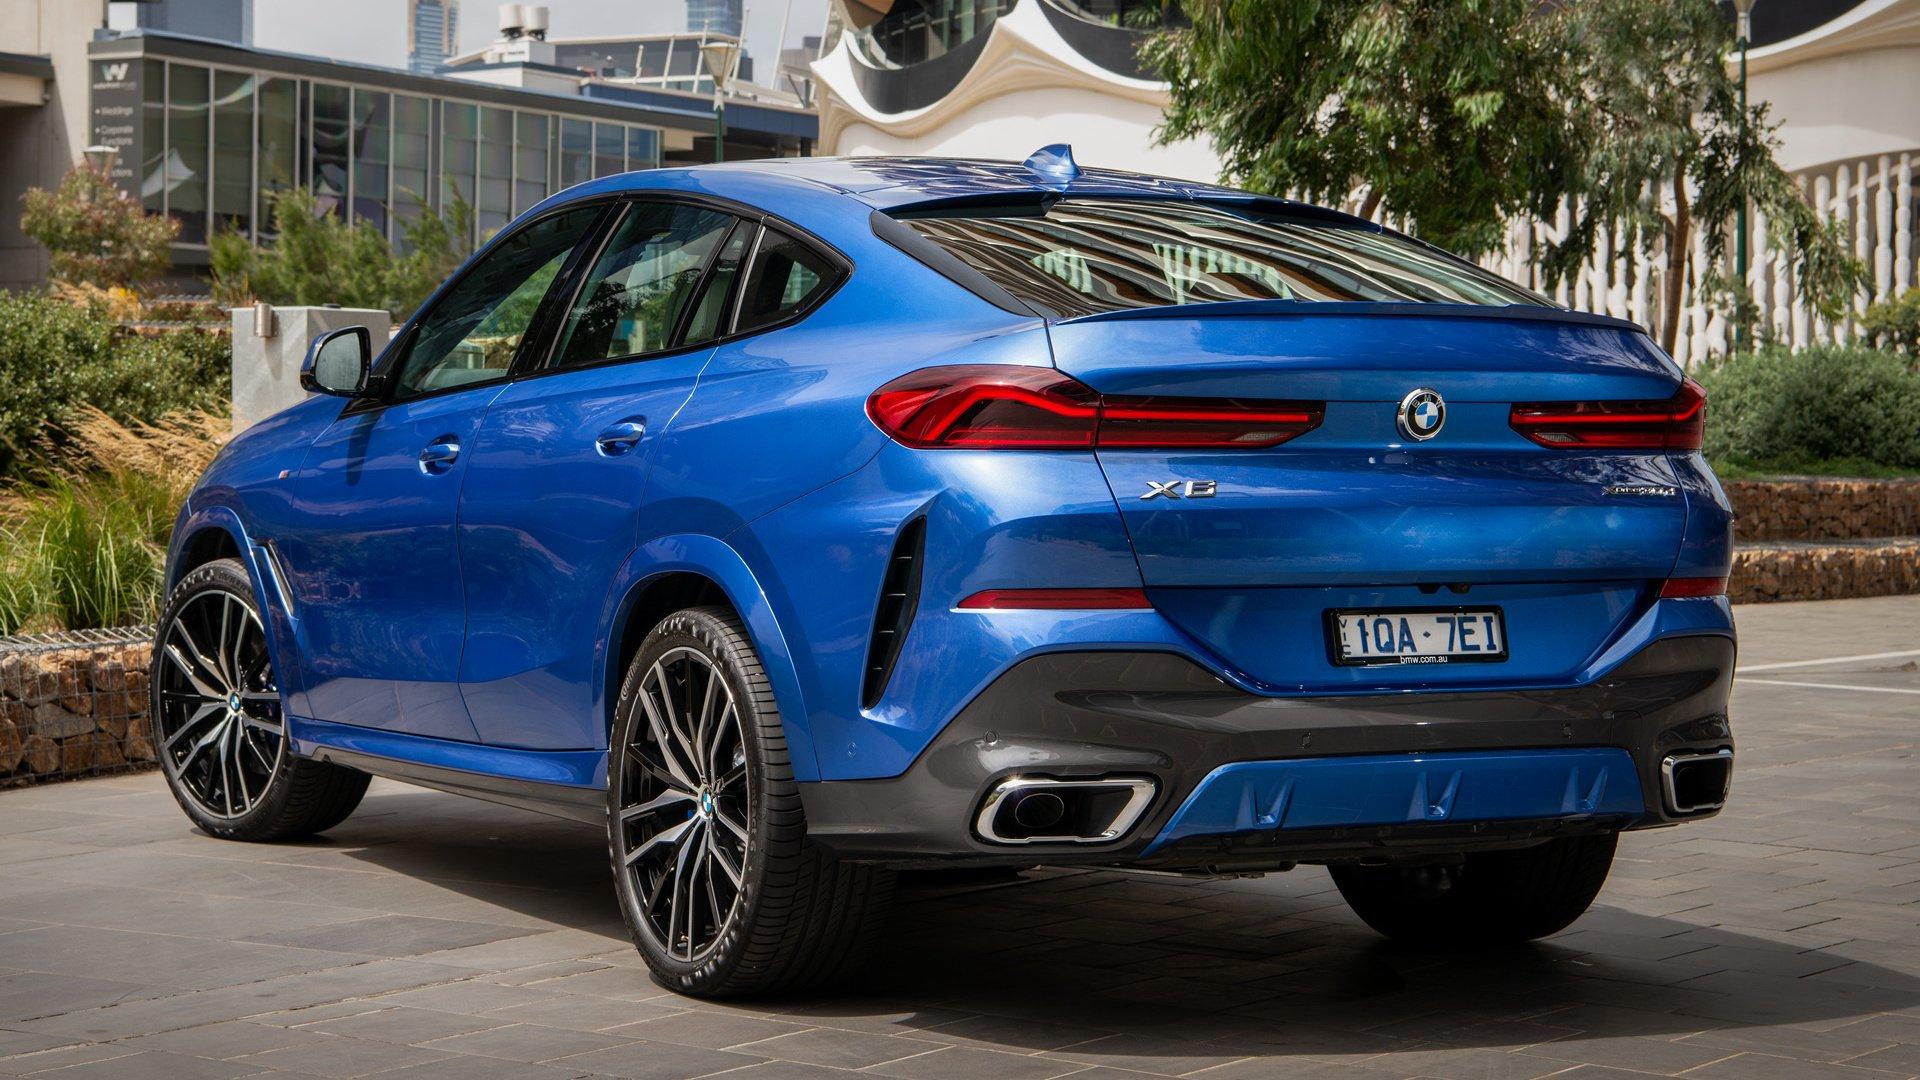 2020 BMW X6 M Sport HD Wallpaper | Background Image ...